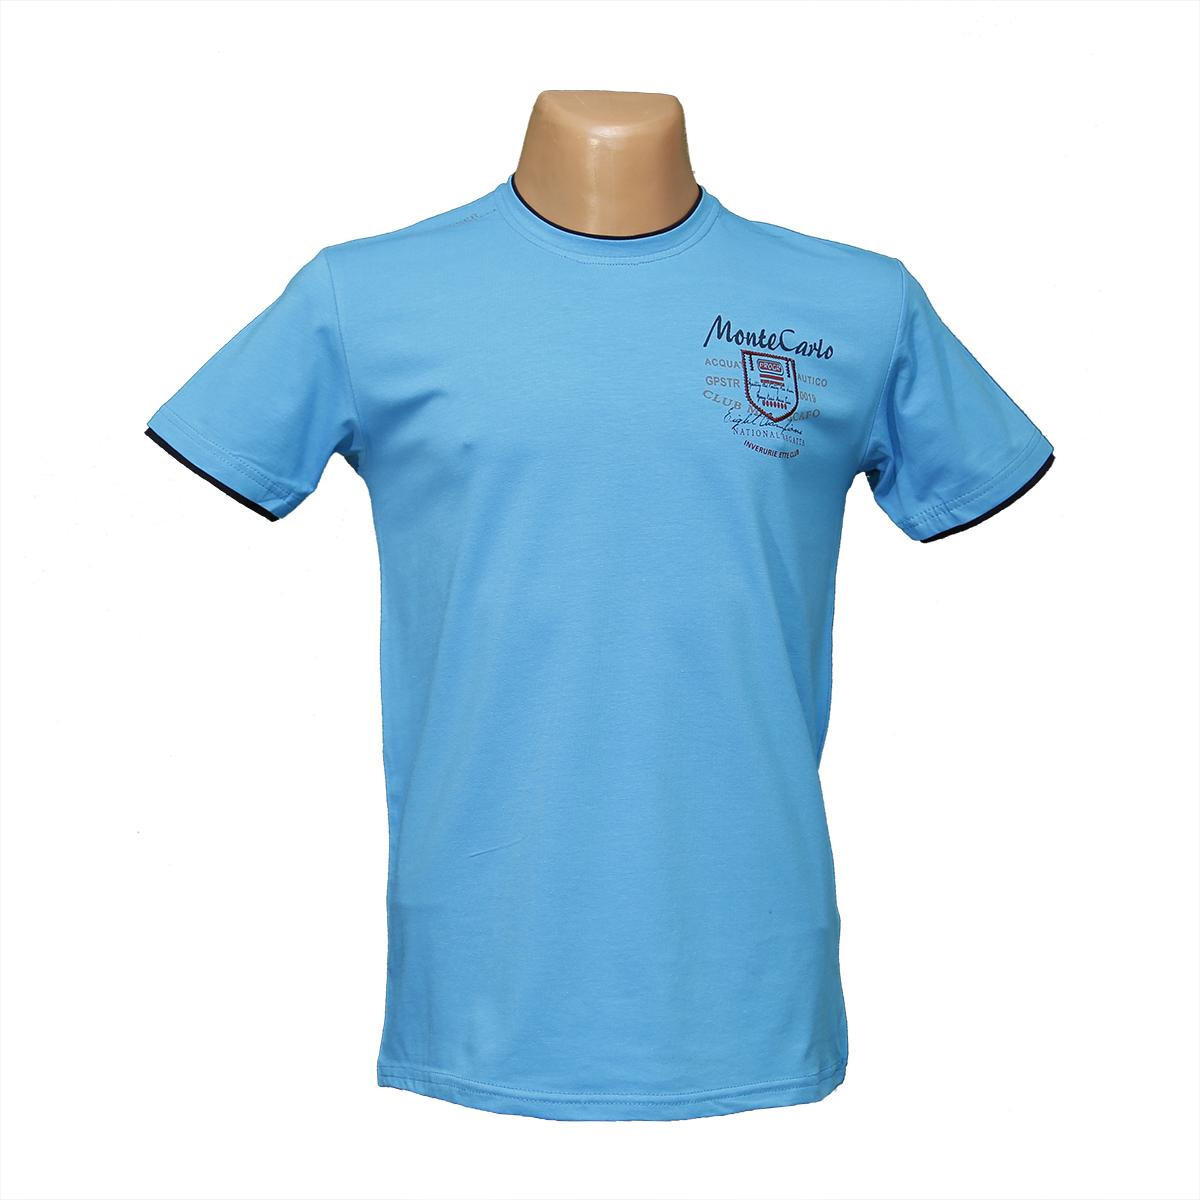 Мужская стрейчевая футболка Lycra тм. BY Walker. пр-во Турция 4042-2